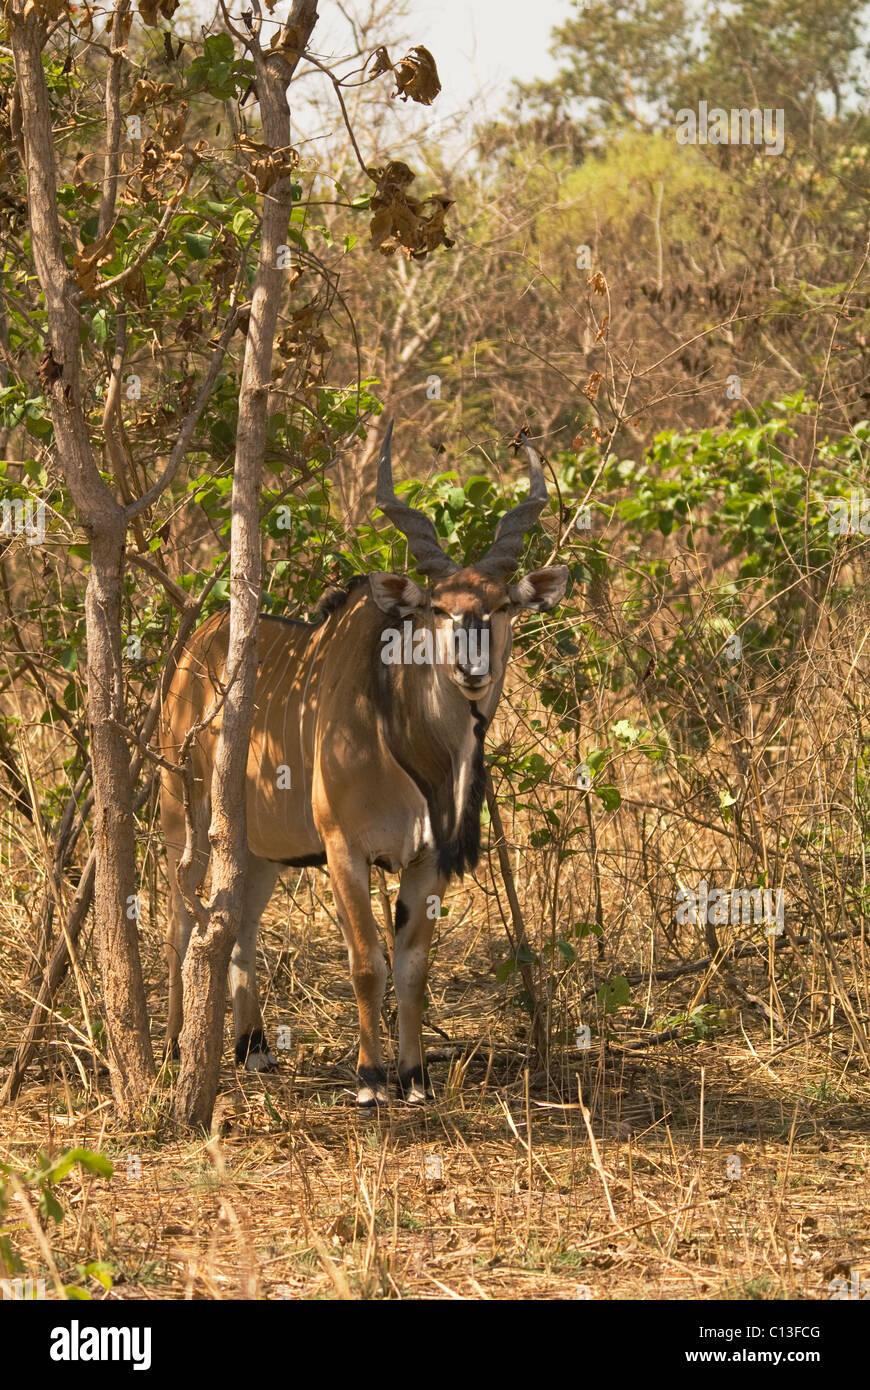 Giant eland (Taurotragus derbianus) noto anche come Lord Derby eland Fathala Game Reserve nel nord del Senegal Immagini Stock